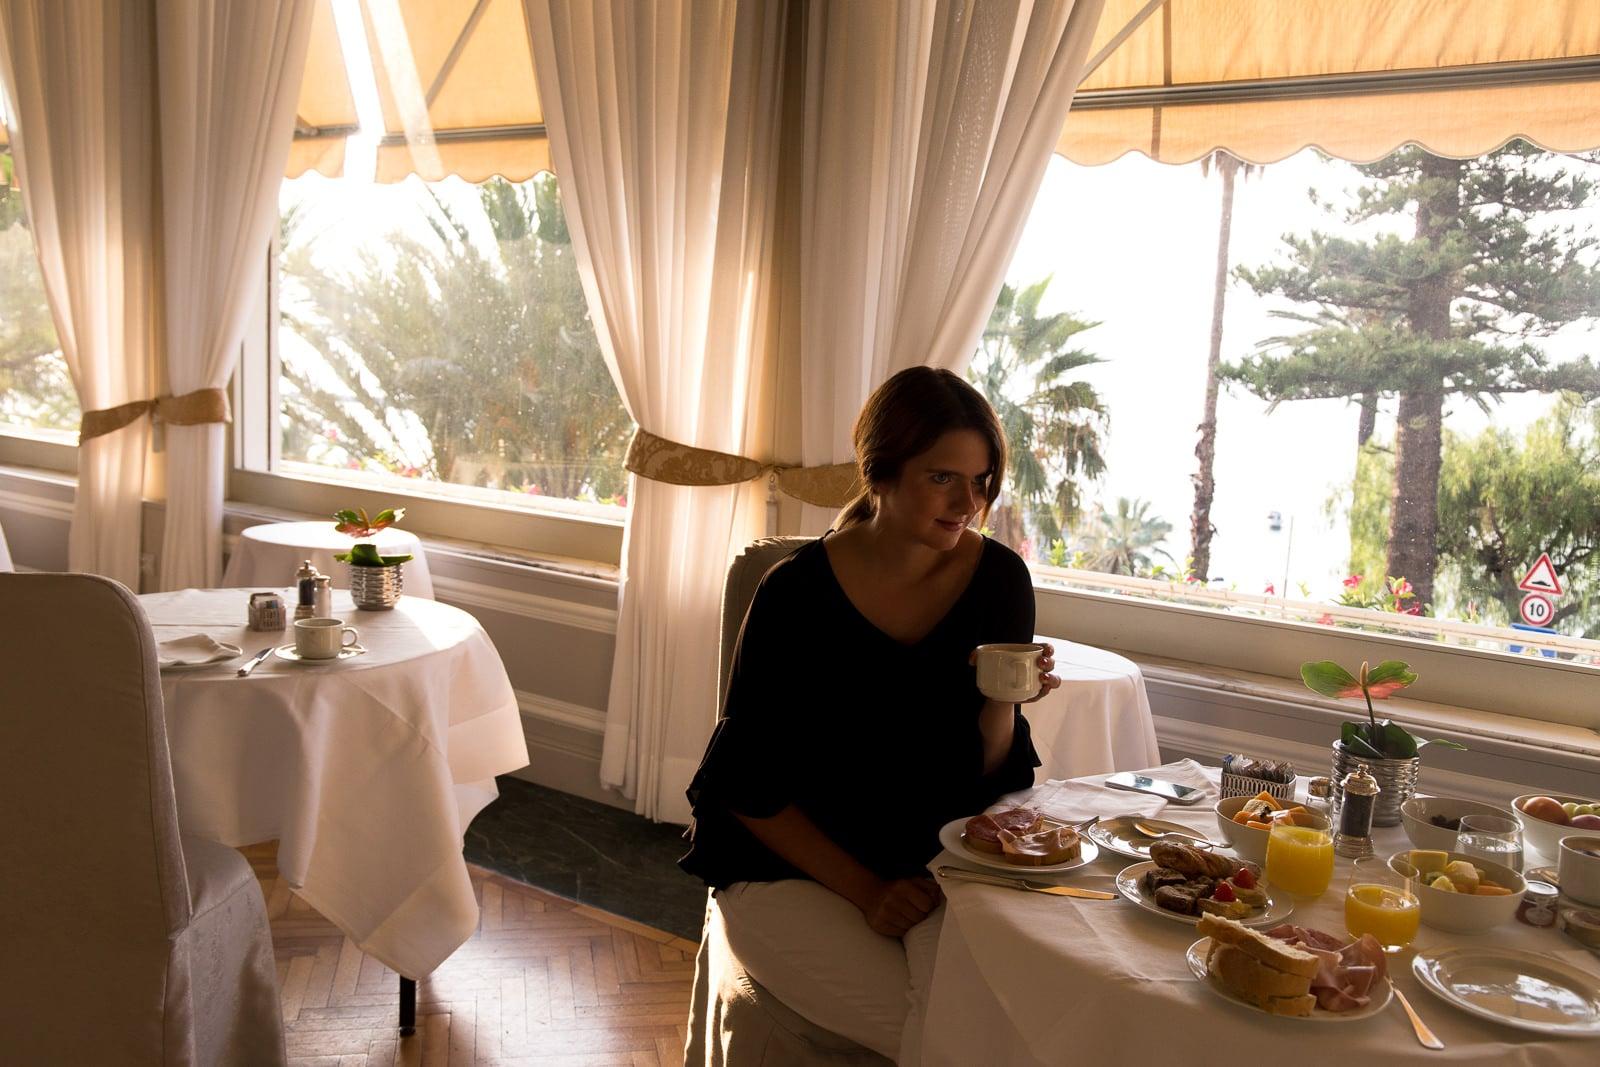 hotelbericht-royal-hotel-sanremo-5-sterne-luxus-reise-reise-blog-des-belles-choses-1